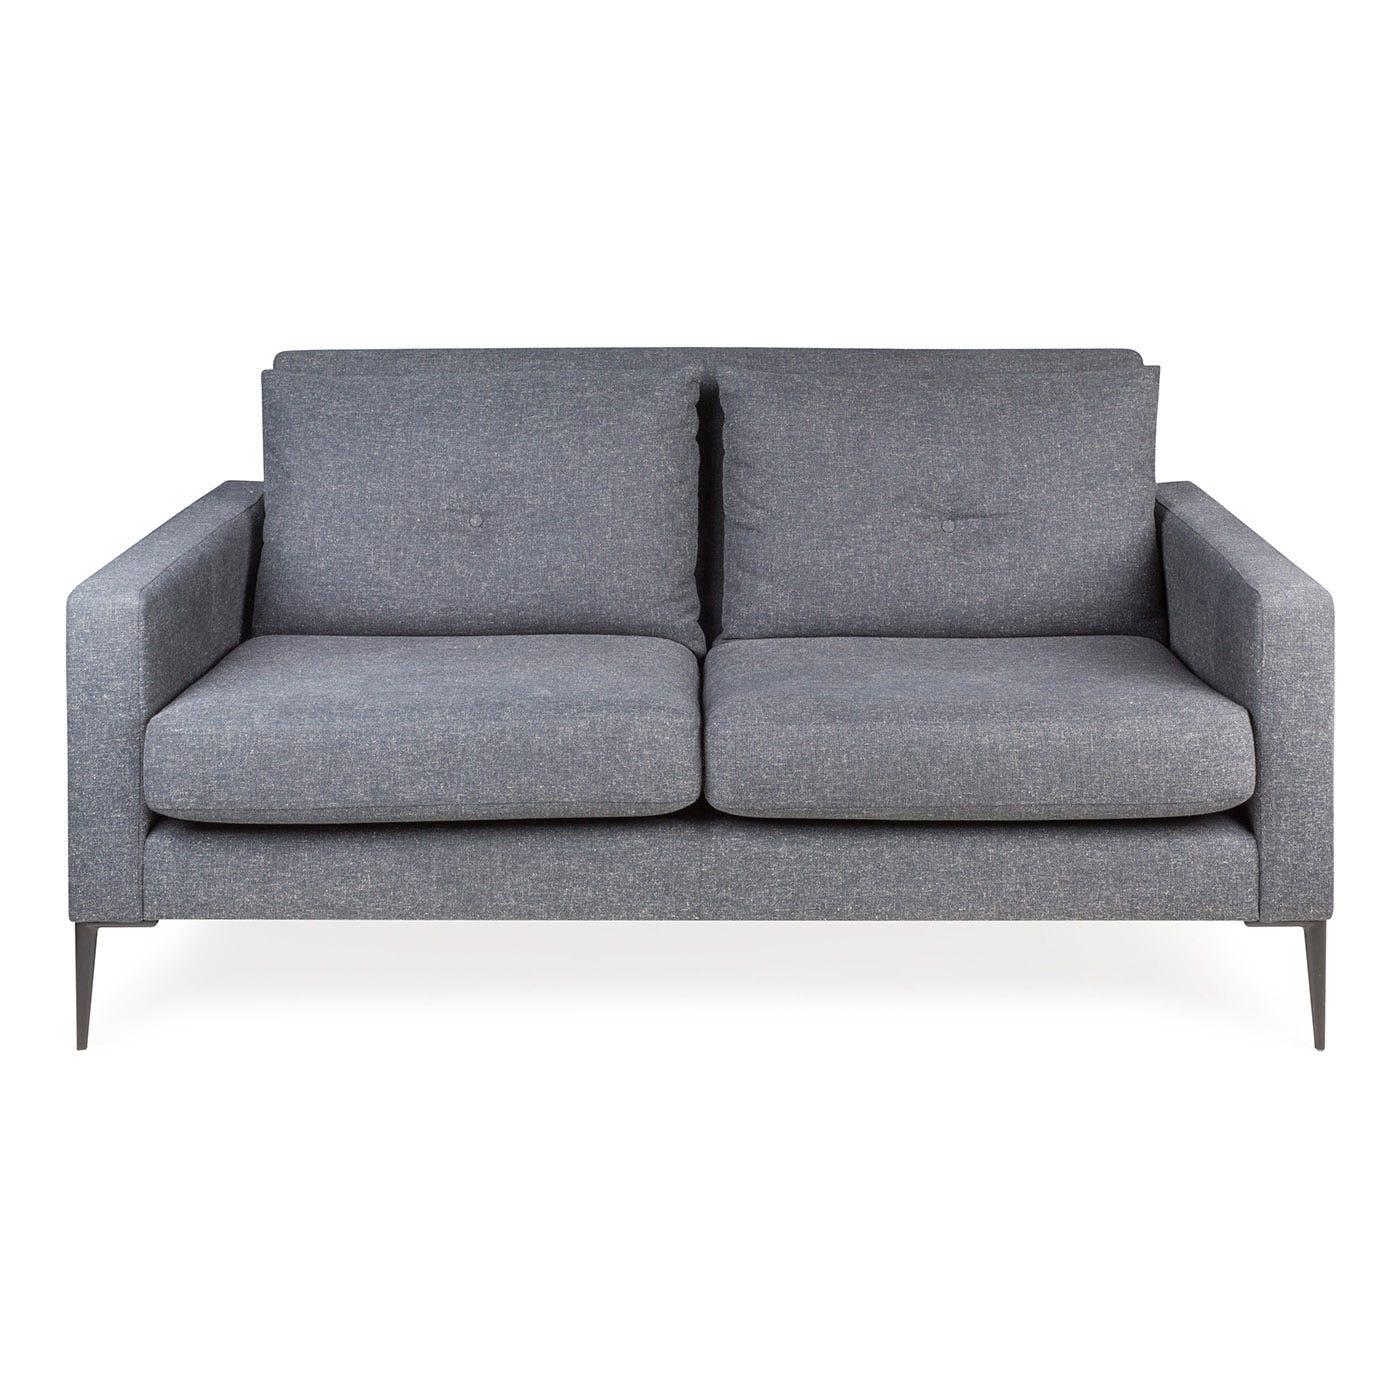 Brunel 3 Seater Sofa Murcia Grey